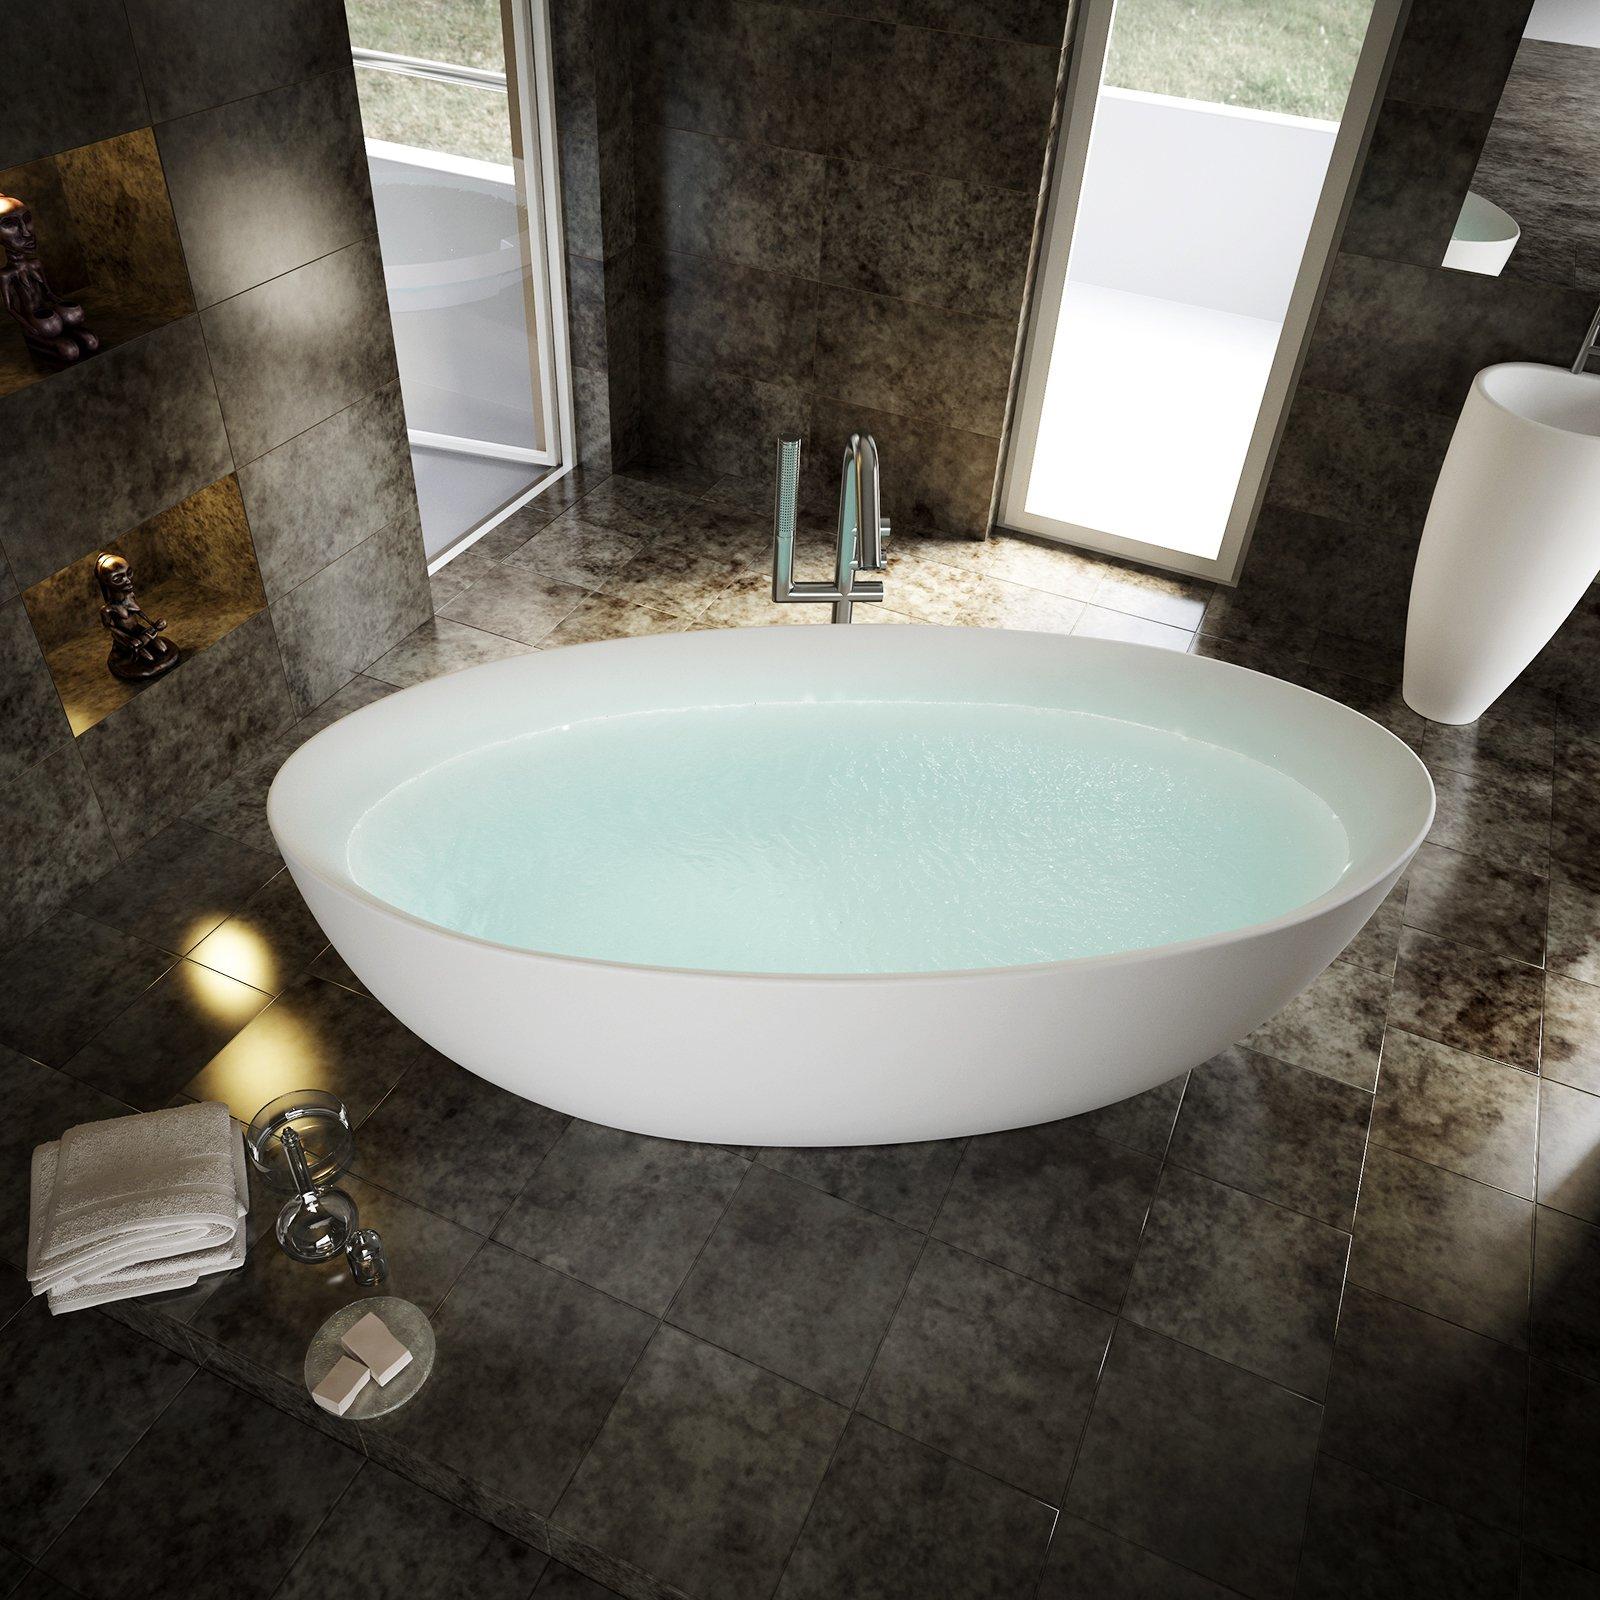 Freistehende Badewanne TERRA Acryl - 186 x 88 cm - Weiß glänzend